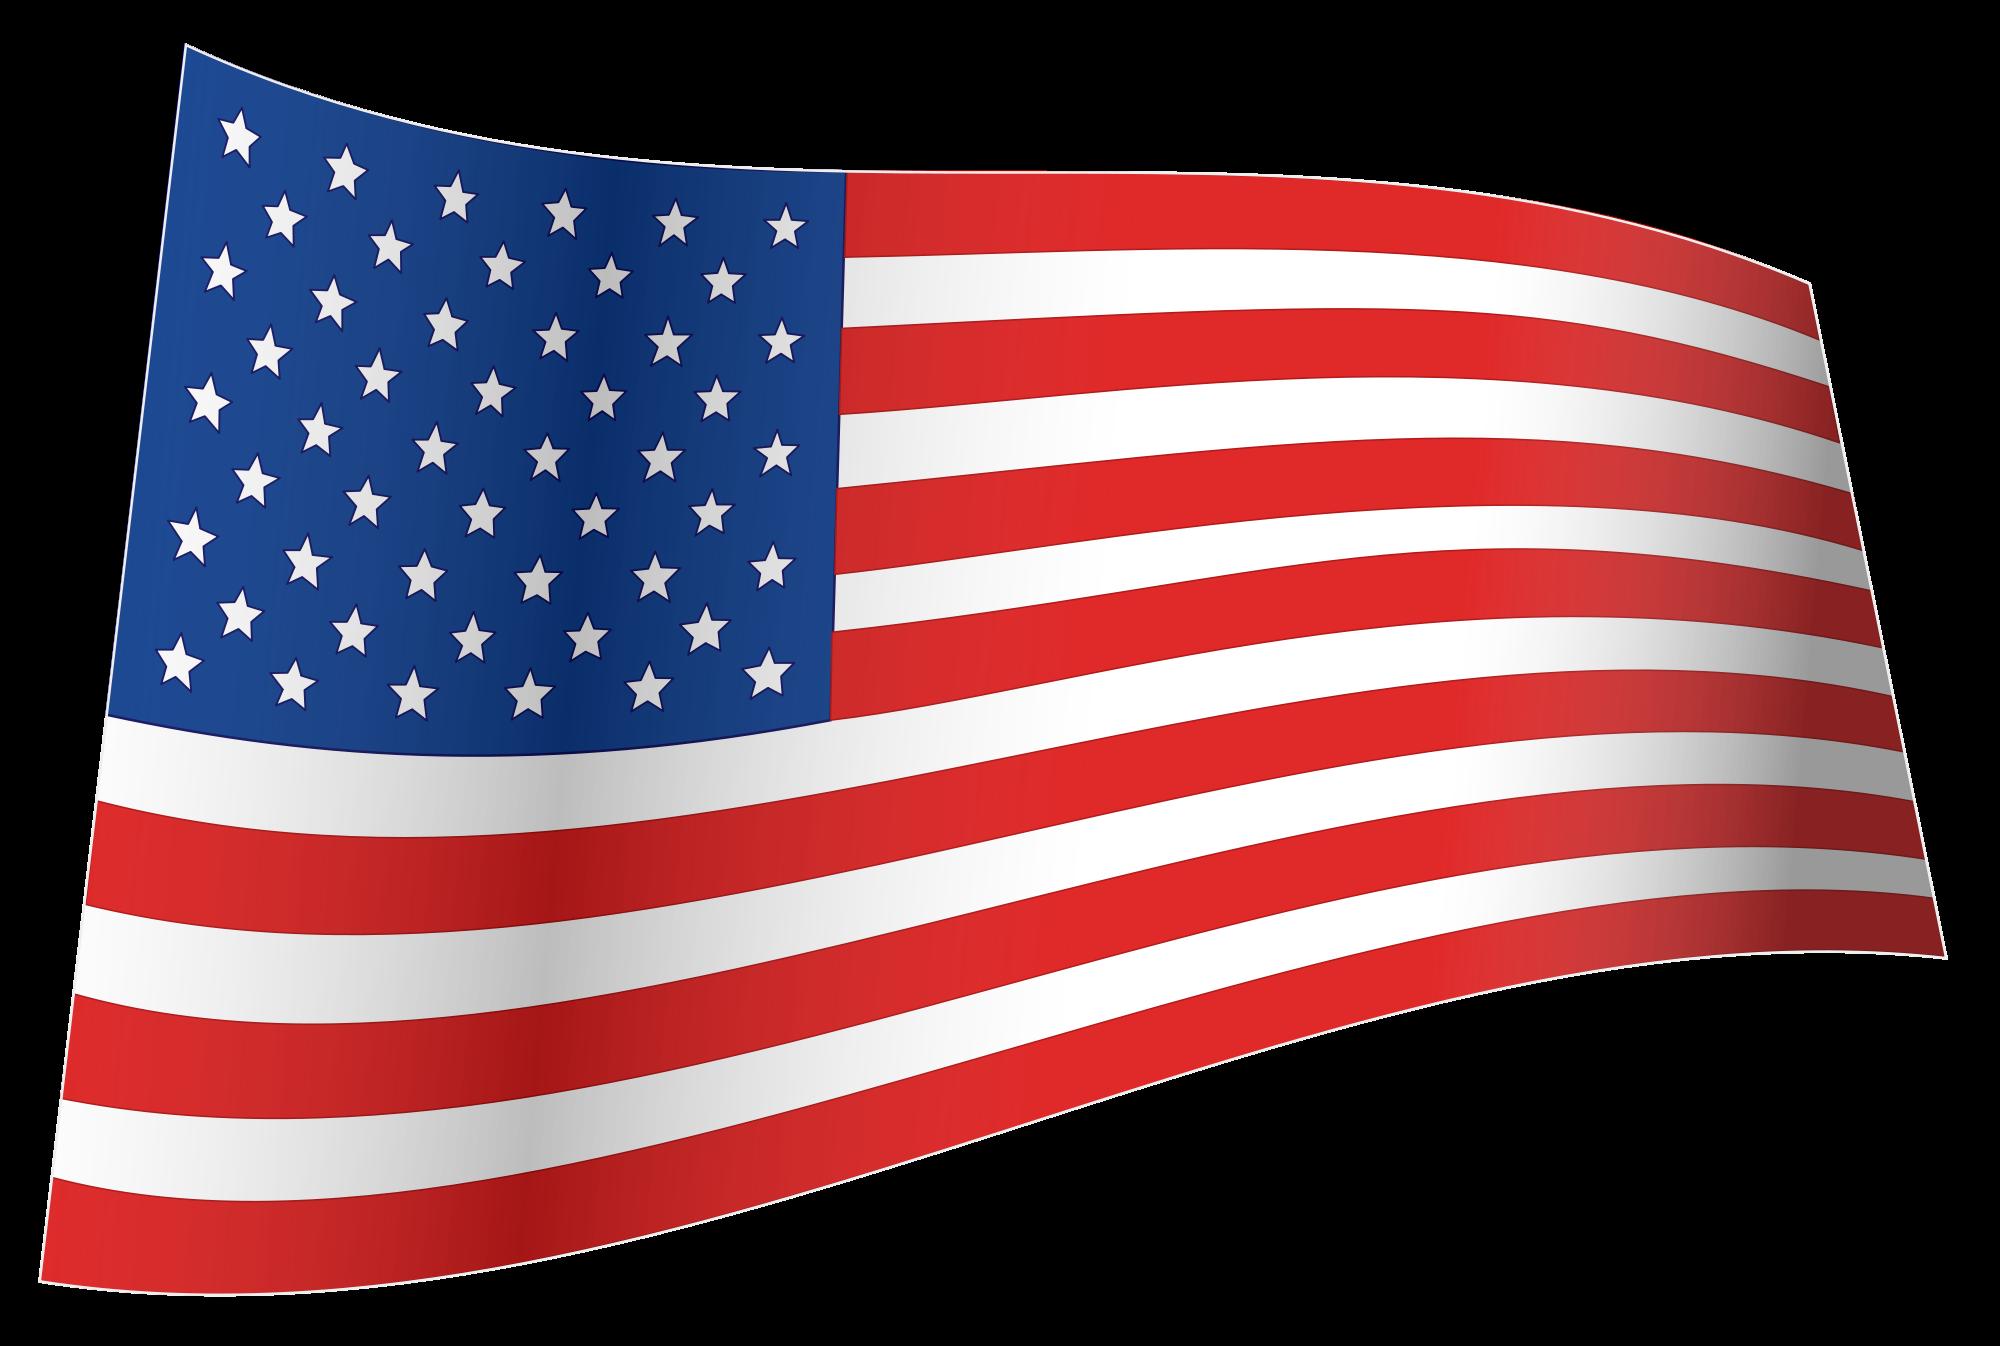 svg download Png waving flag images. Flags clipart transparent background.